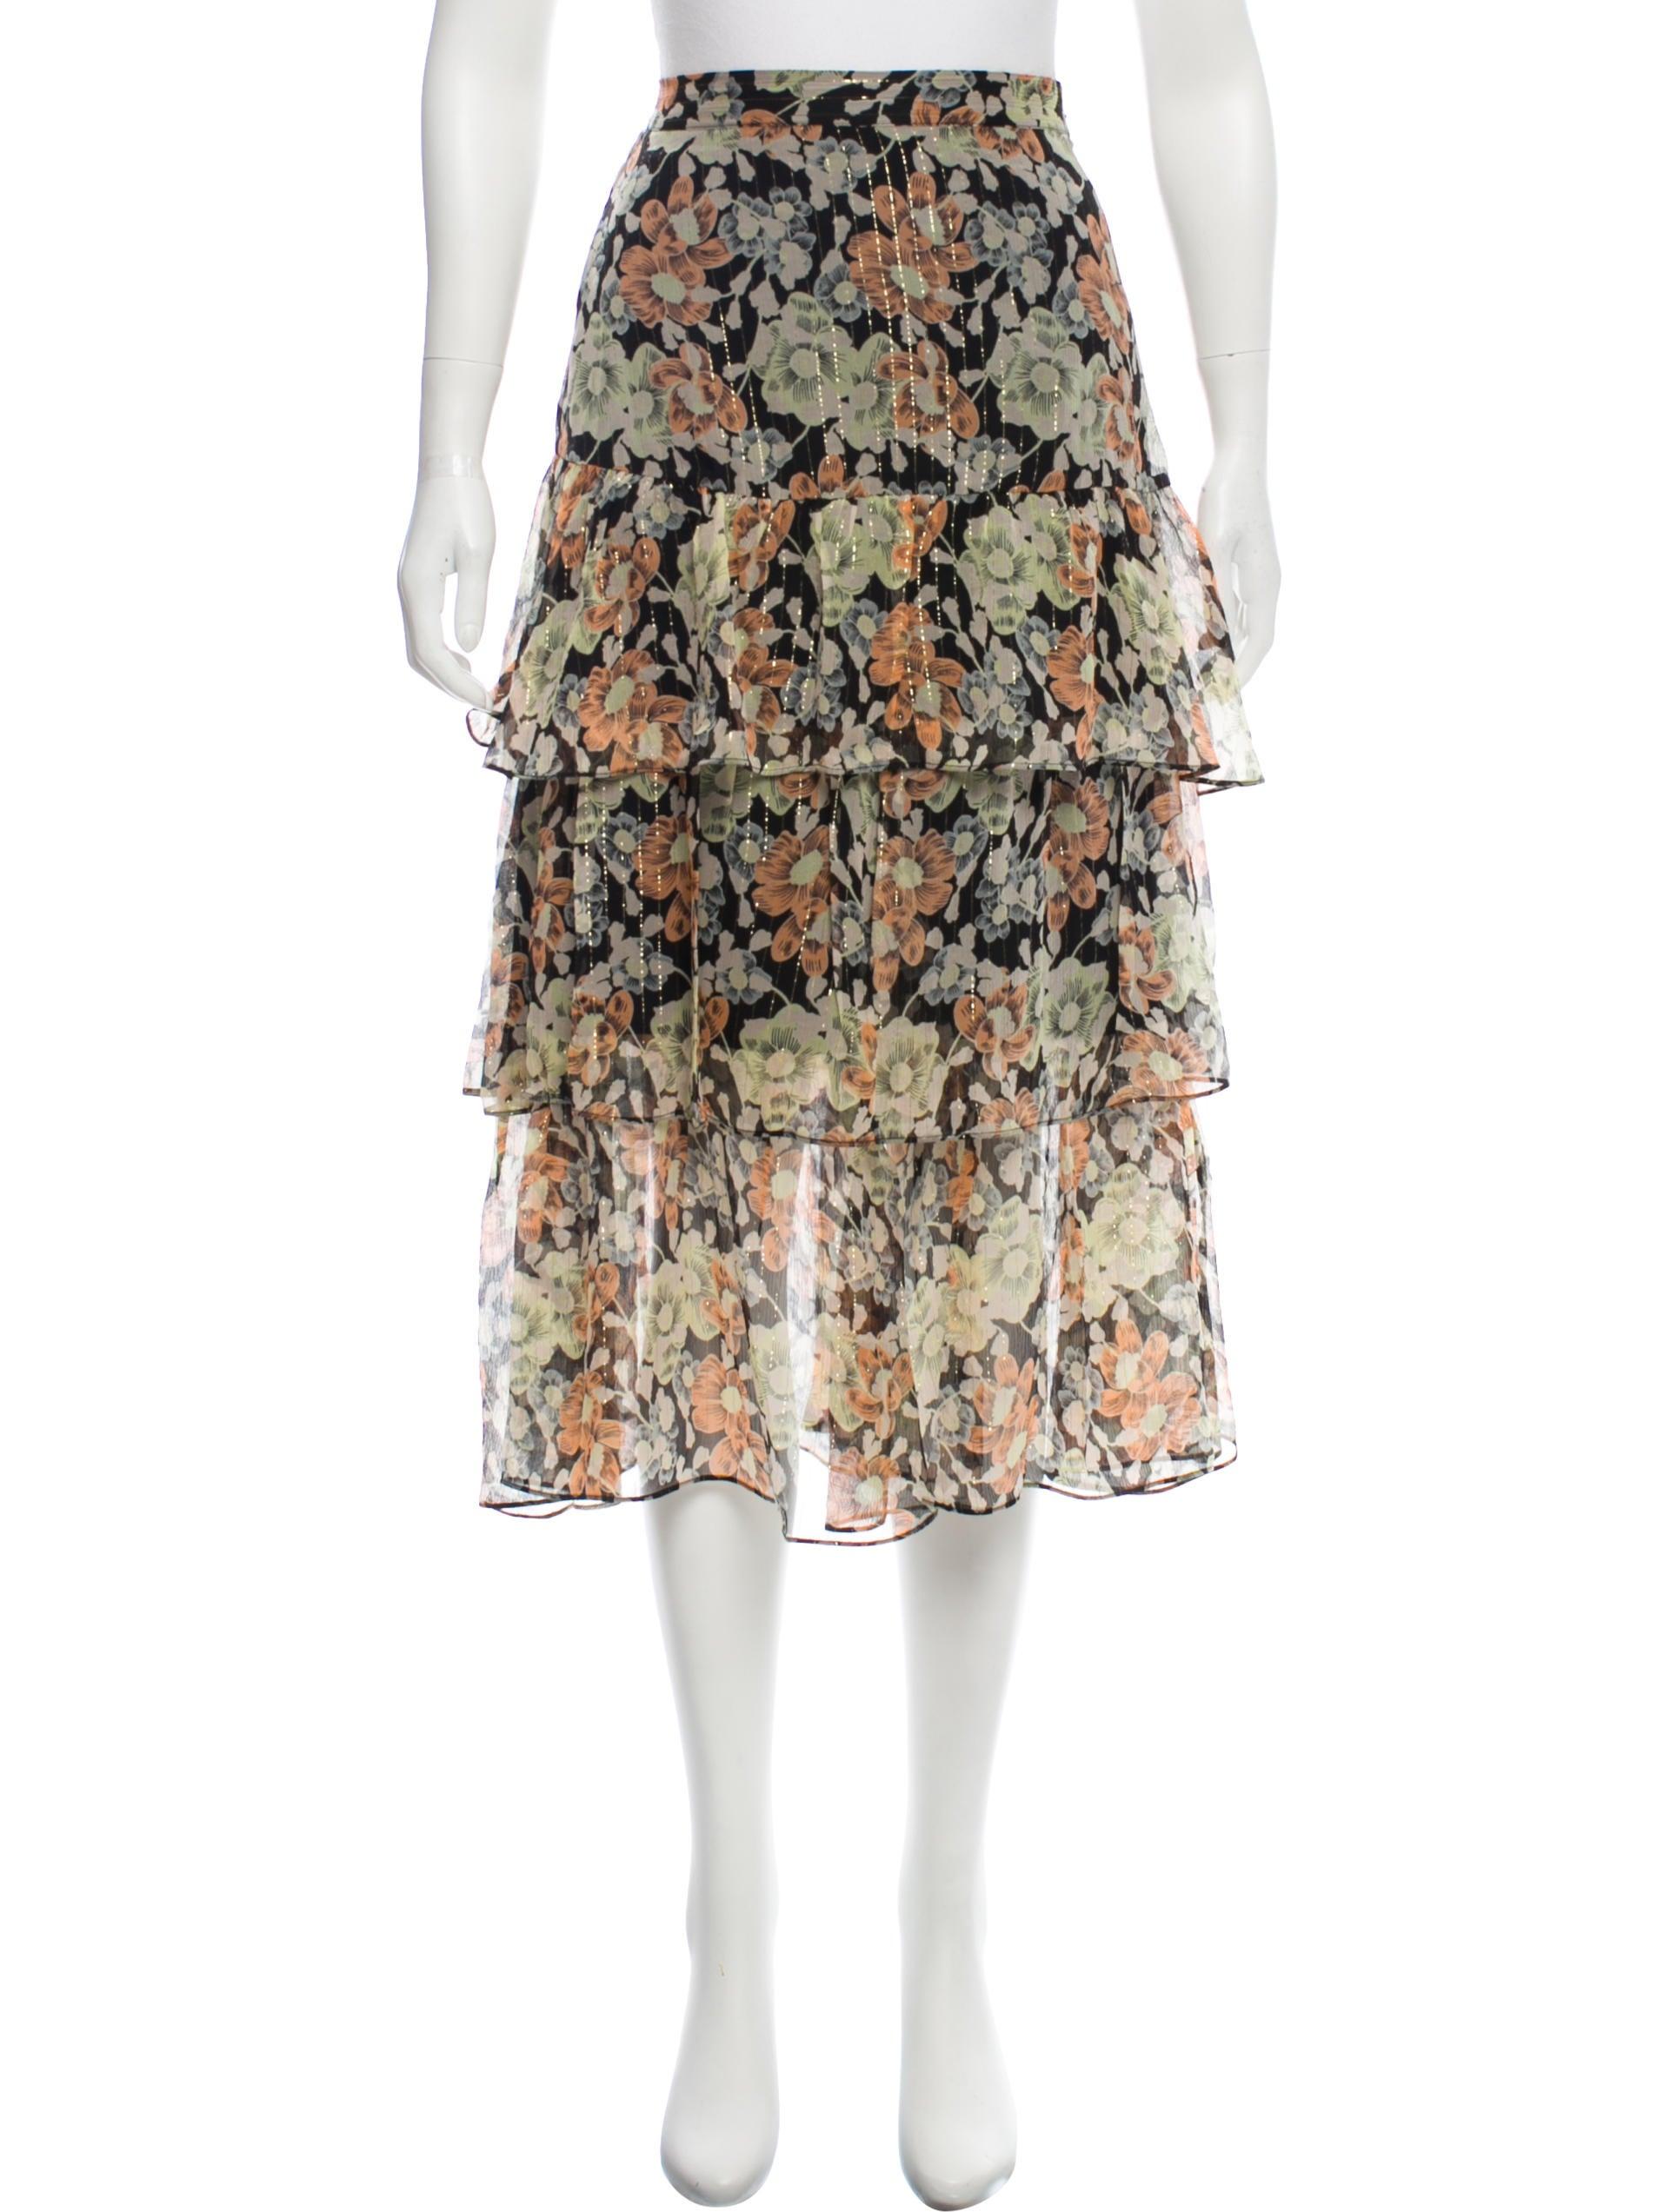 54ef3719f19 The Kooples Silk Tiered Skirt w/ Tags - Clothing - WKOOP21374 | The ...